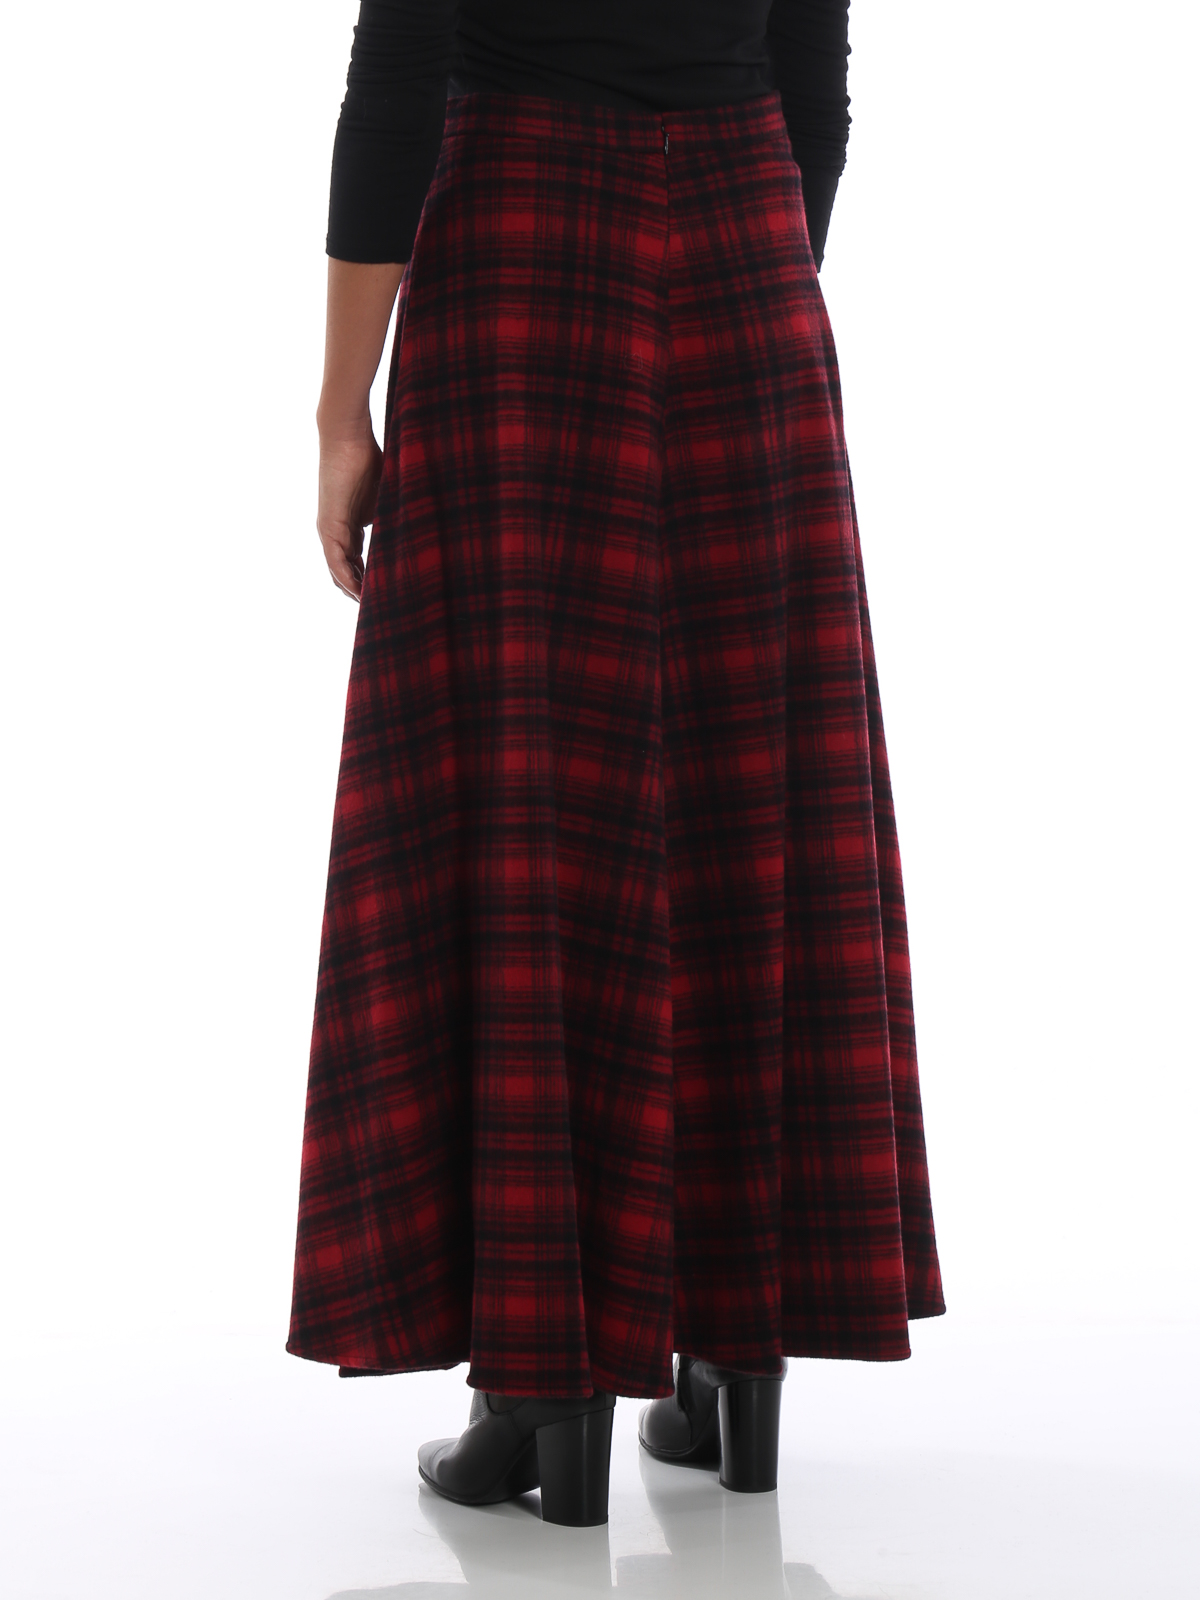 info for 96de0 1c6fd Woolrich - Gonna lunga e ampia in lana a quadri - Gonne ...